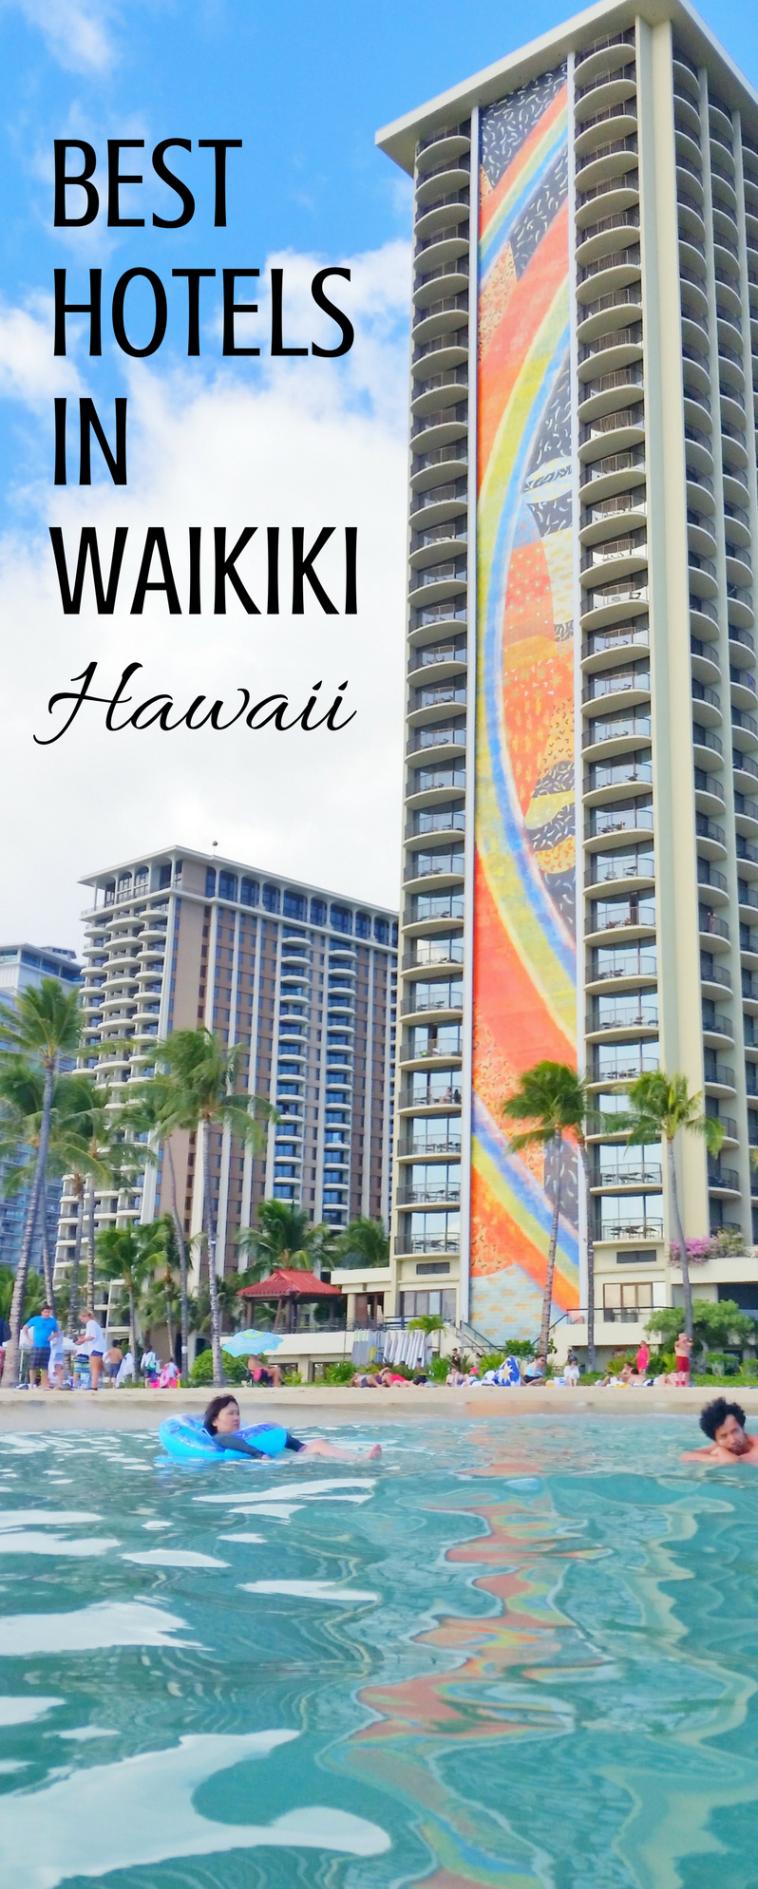 Best Waikiki Hotels Rainbow Tower At Hilton Hawaiian Village